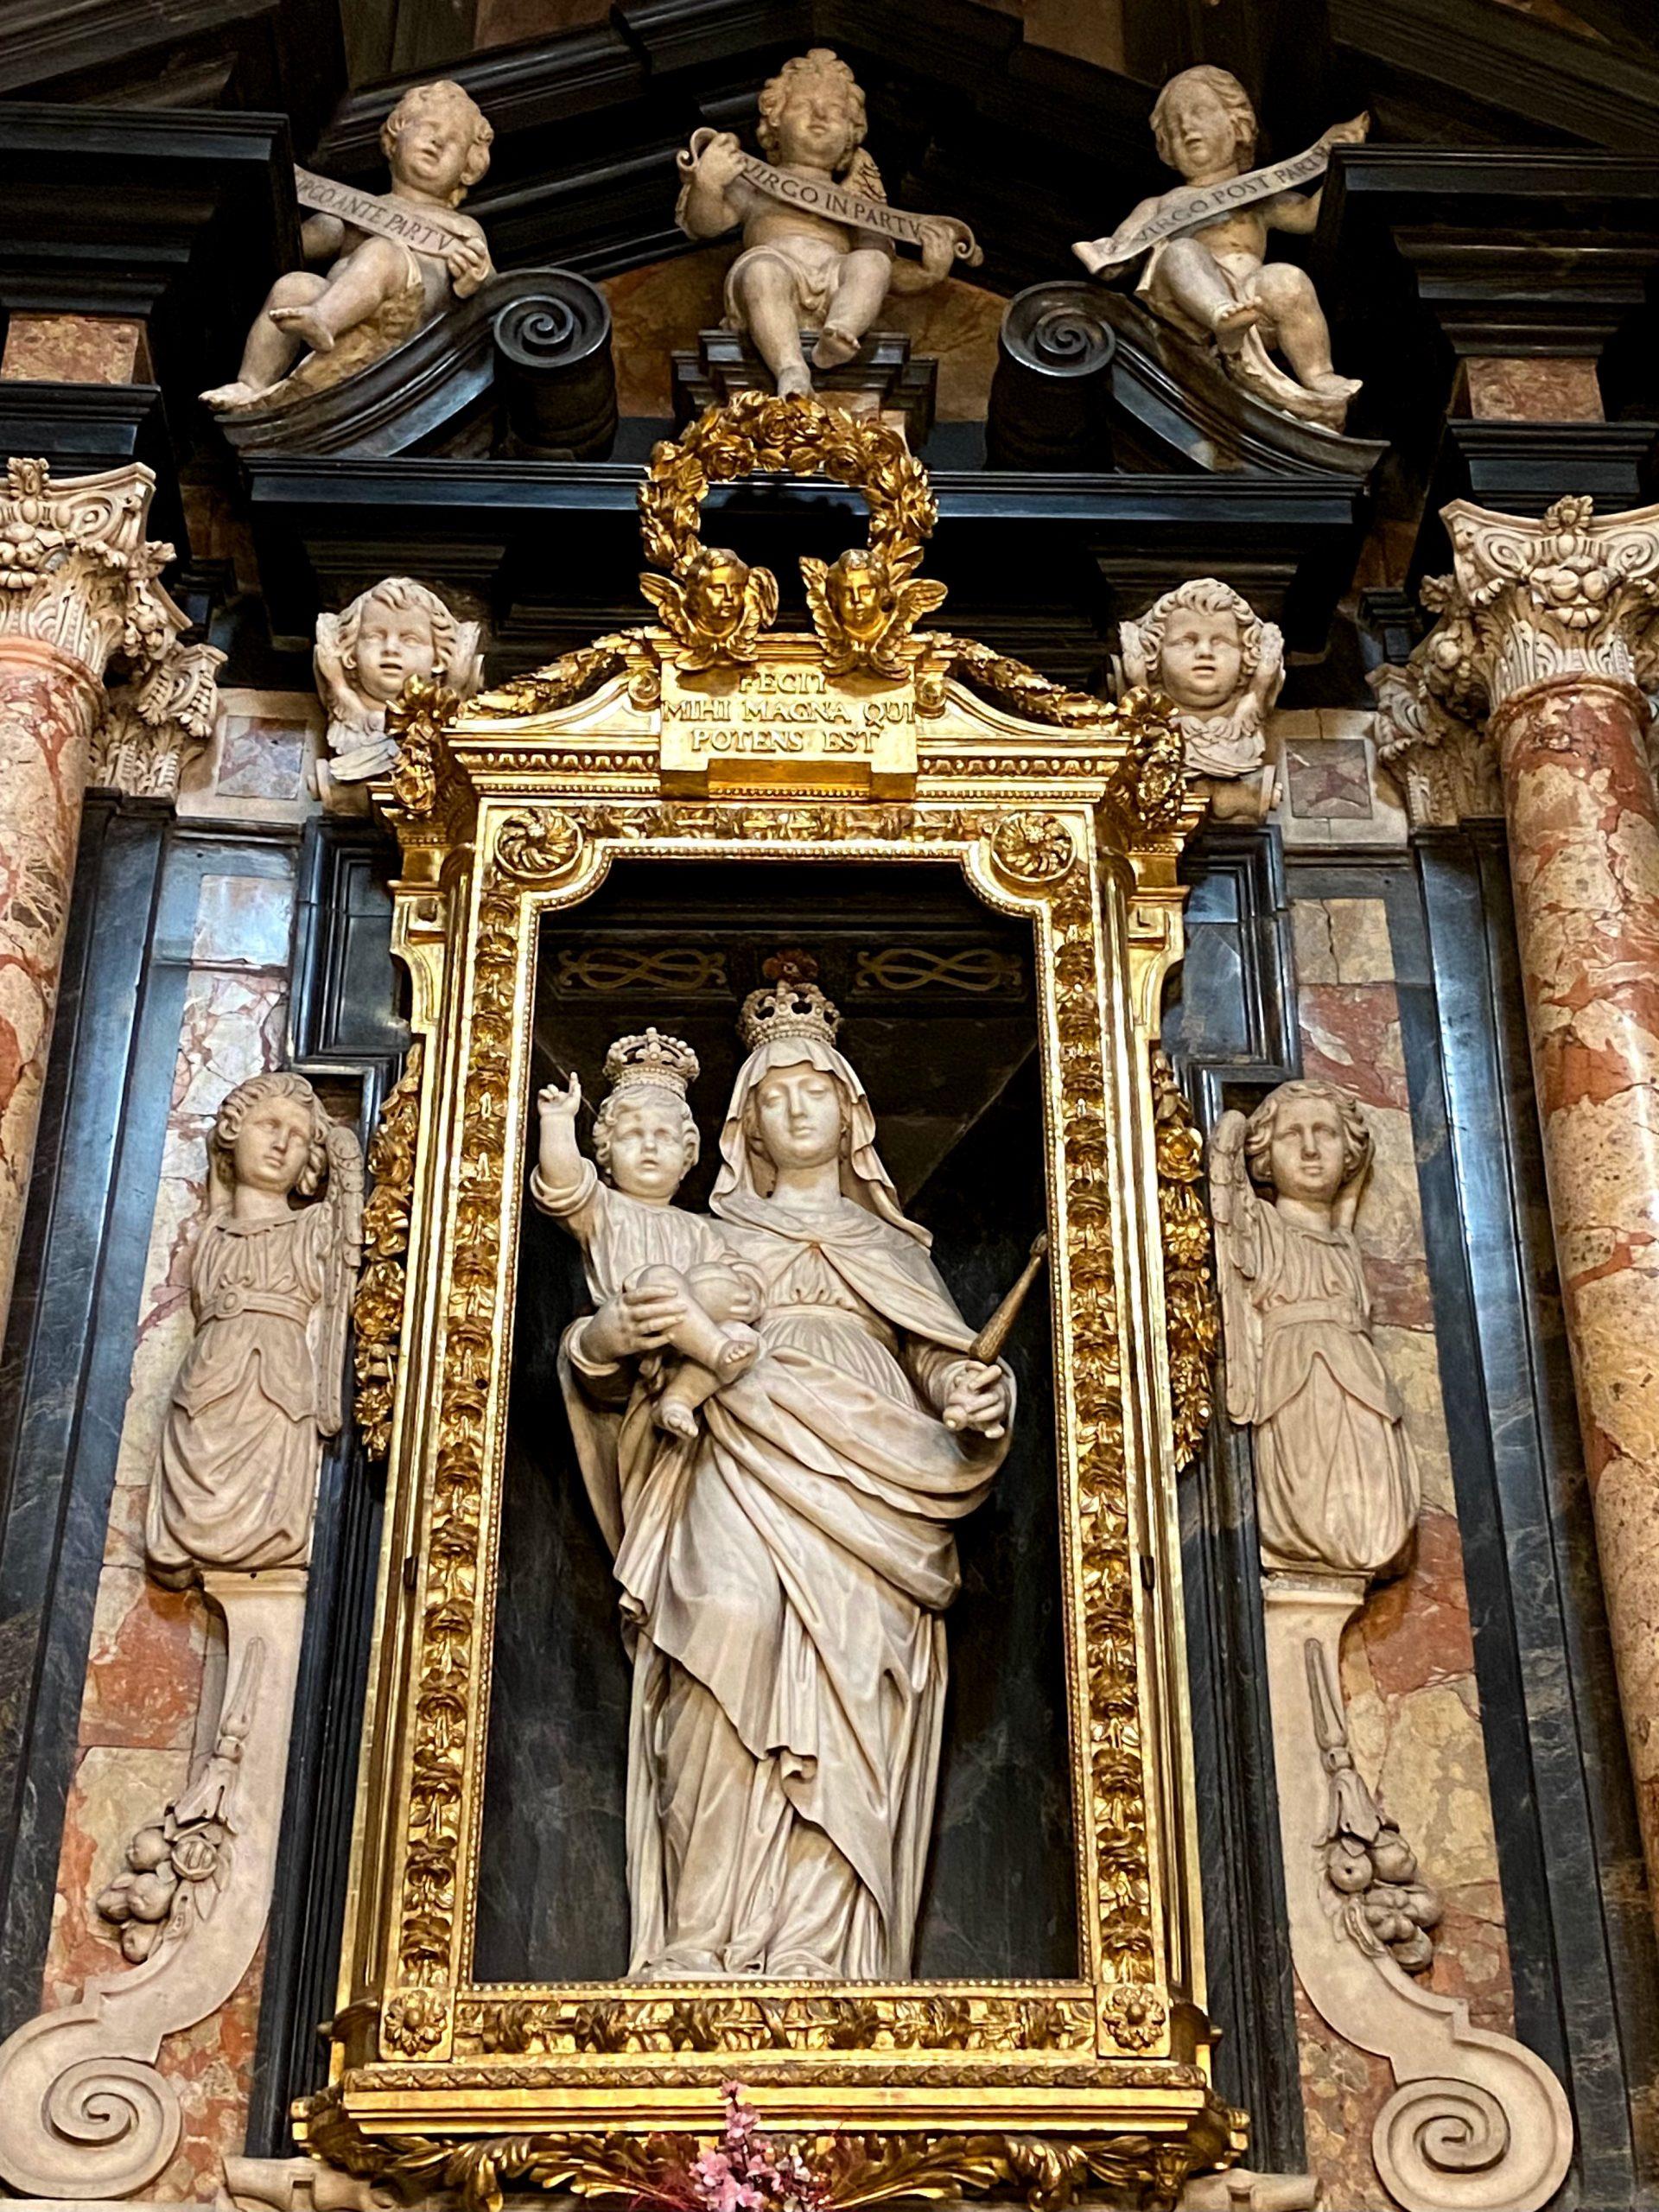 La cappella della Beata Vergine Maria